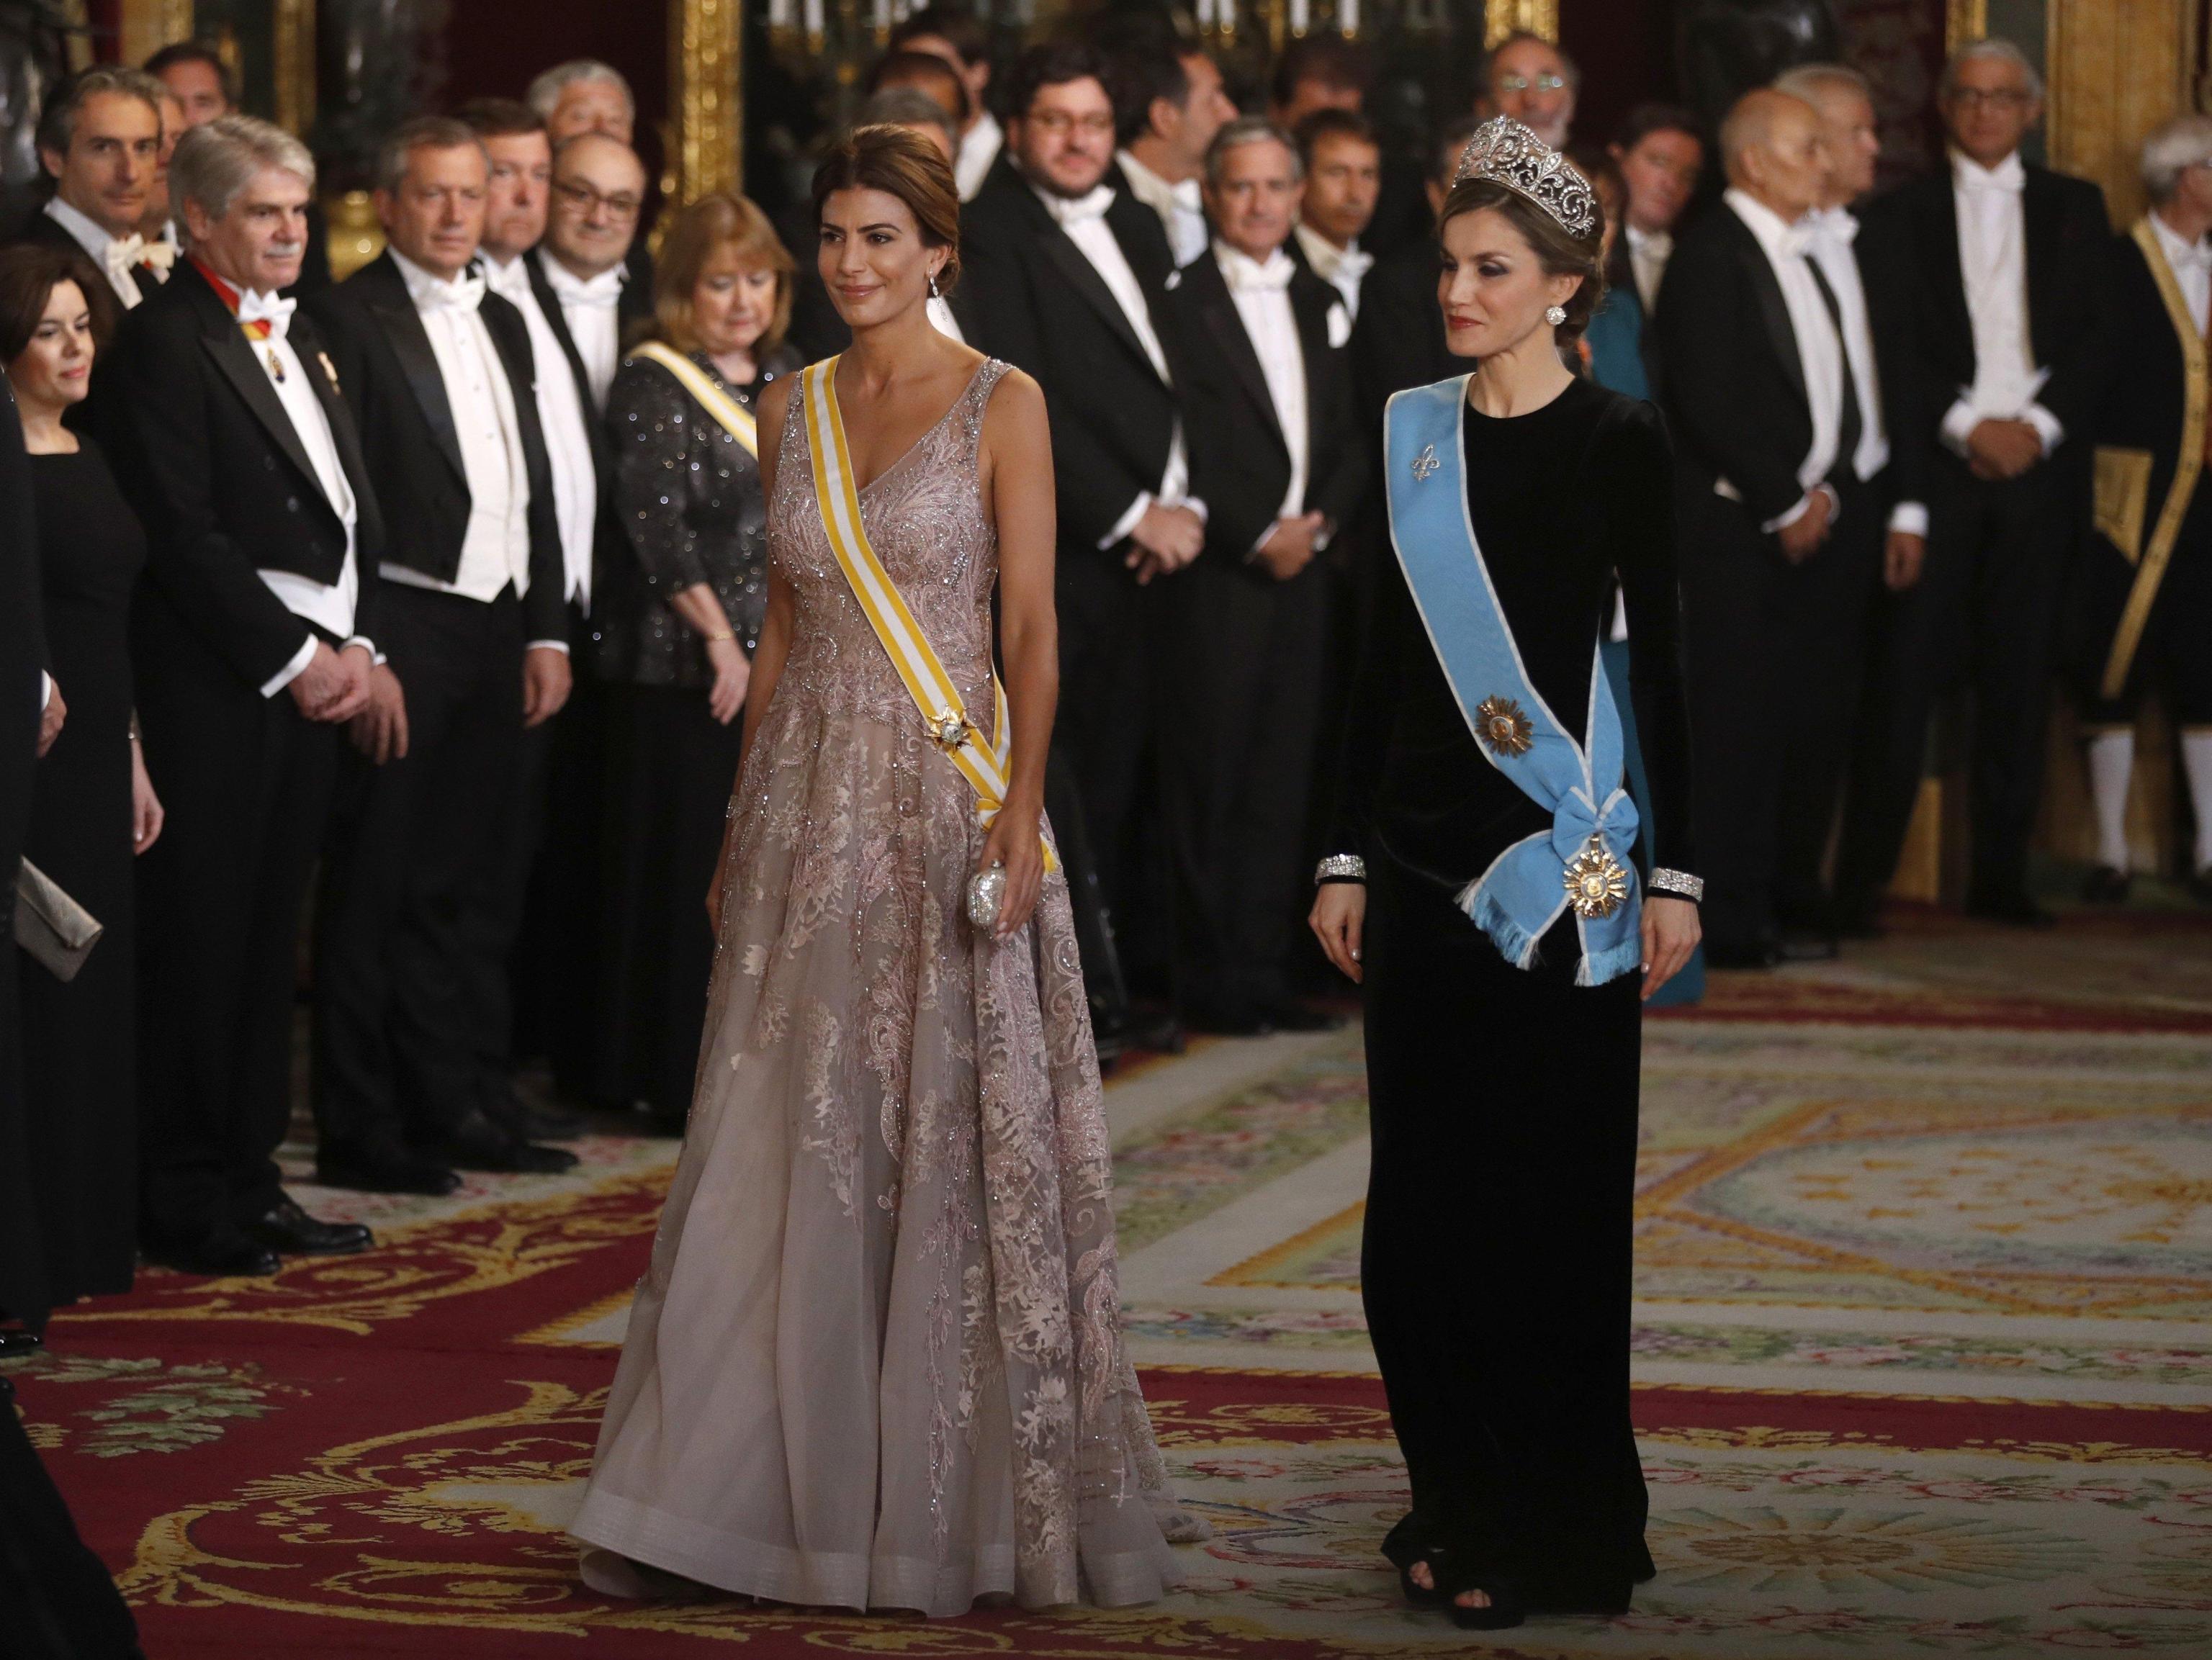 Argentinian President Mauricio Macri visits Spain